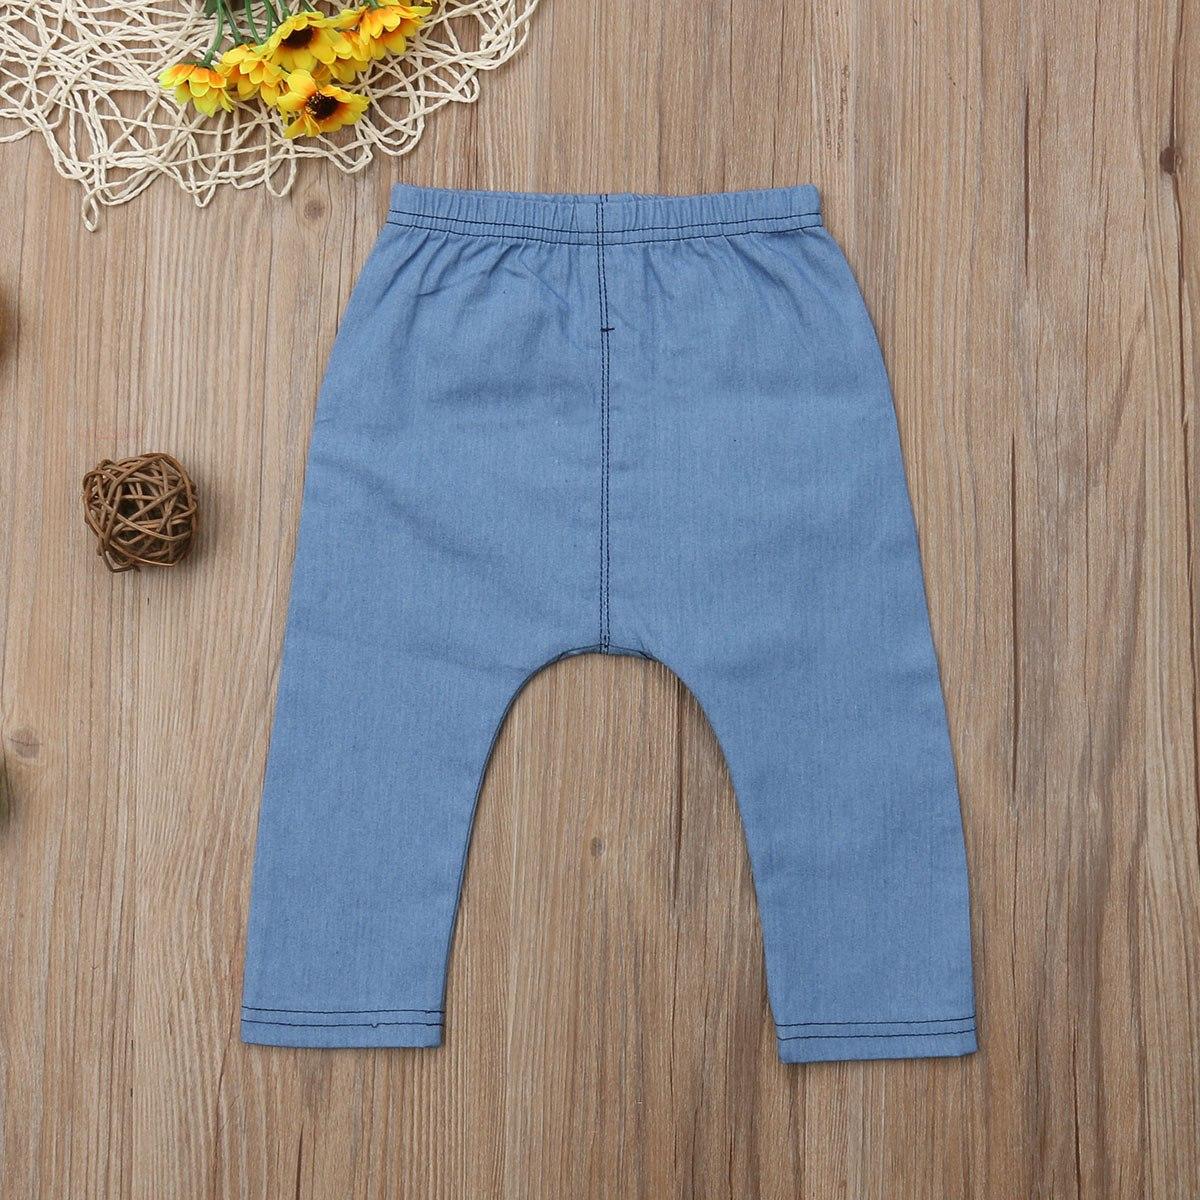 Mini Shatsu Baby Boys Electric Infant Sweat Pants